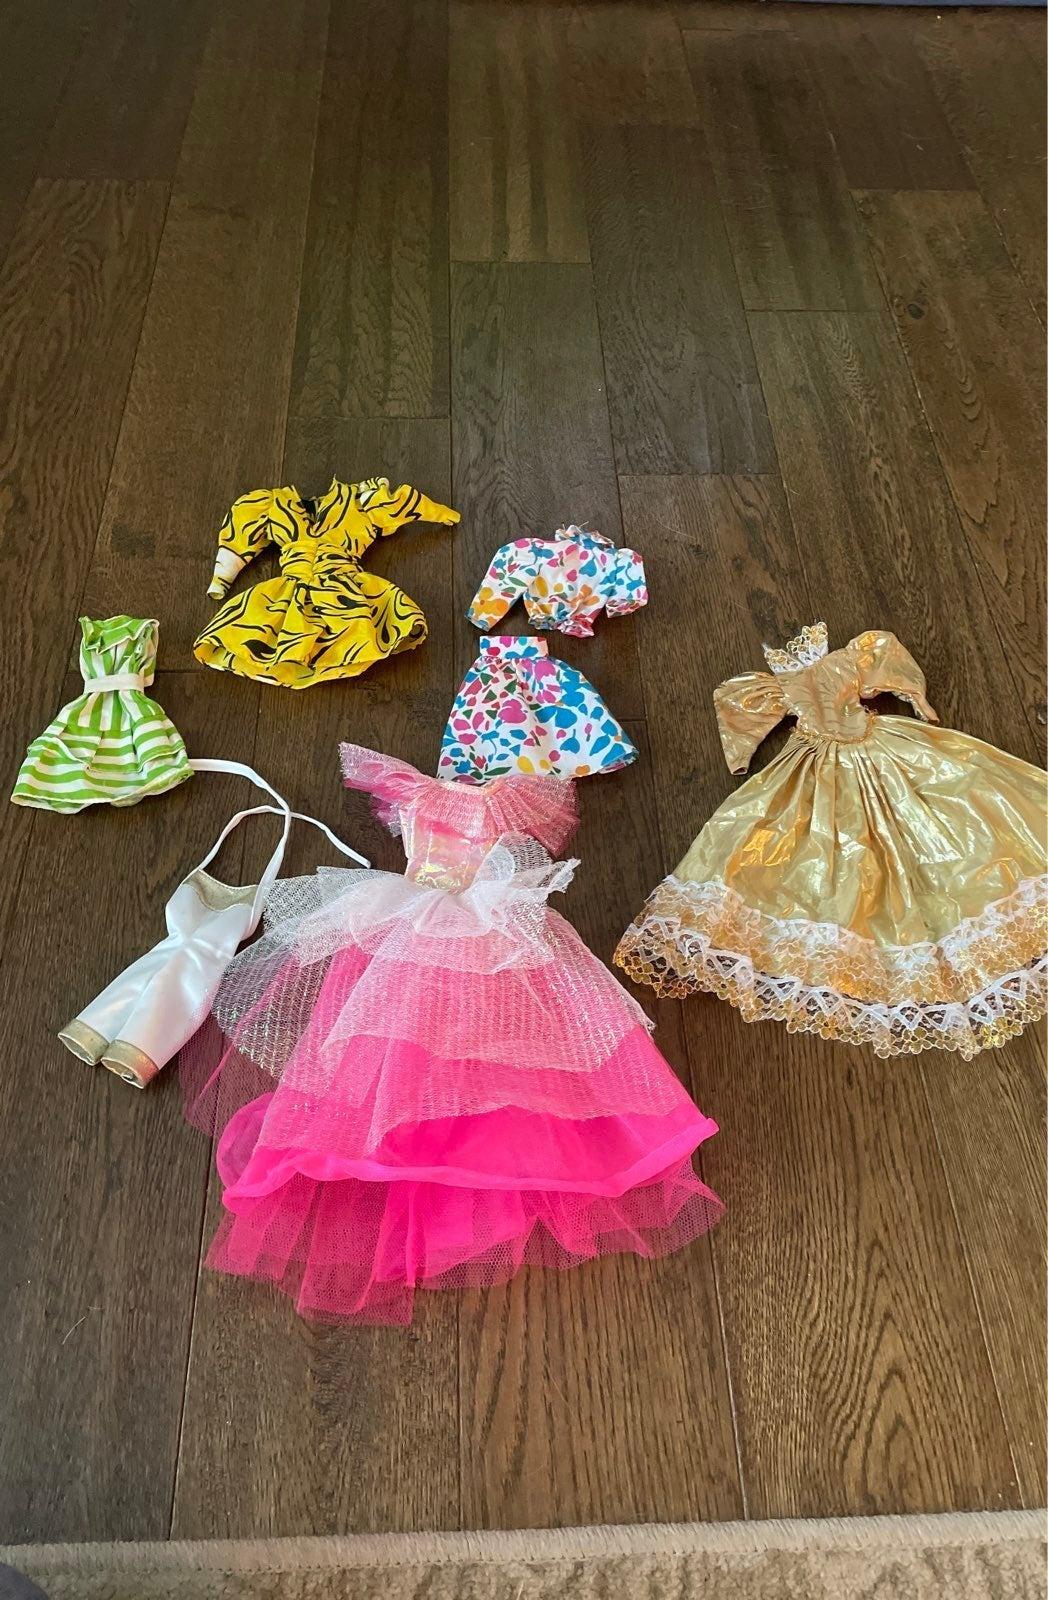 Barbie clothing lot